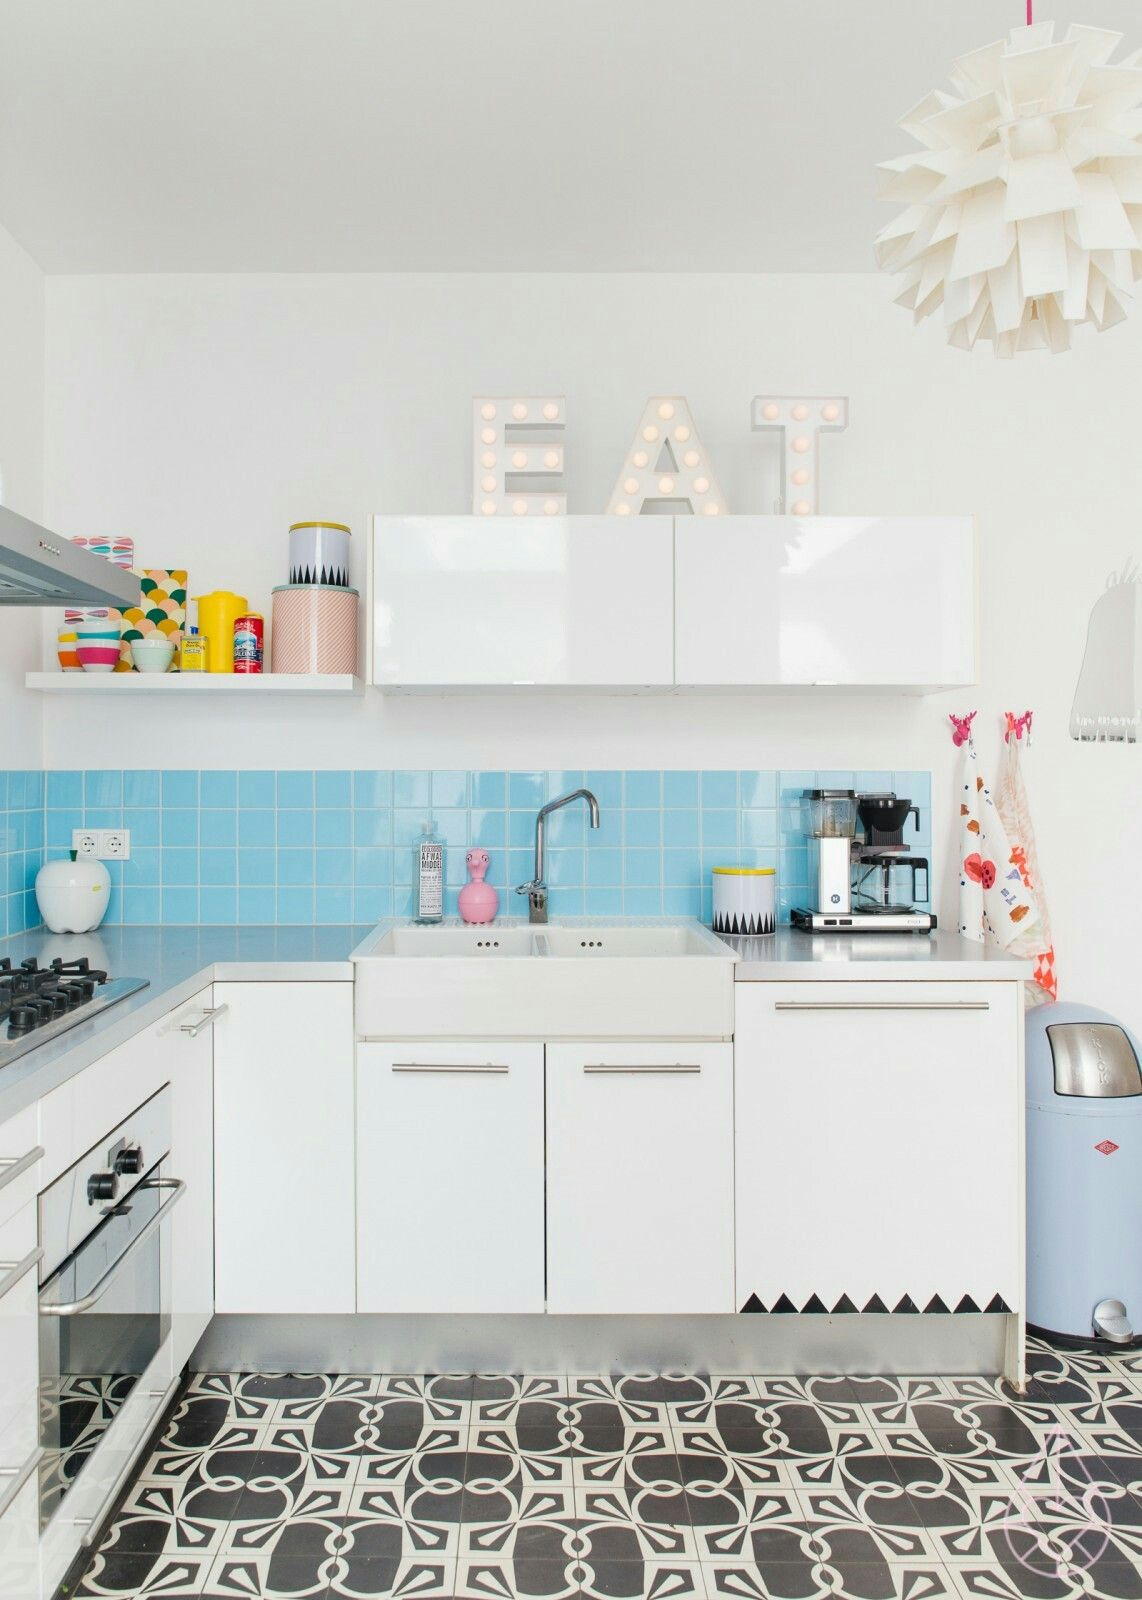 Pin by Laura Bazzell on Kitchen & Bath   Pinterest   Kitchen decor ...